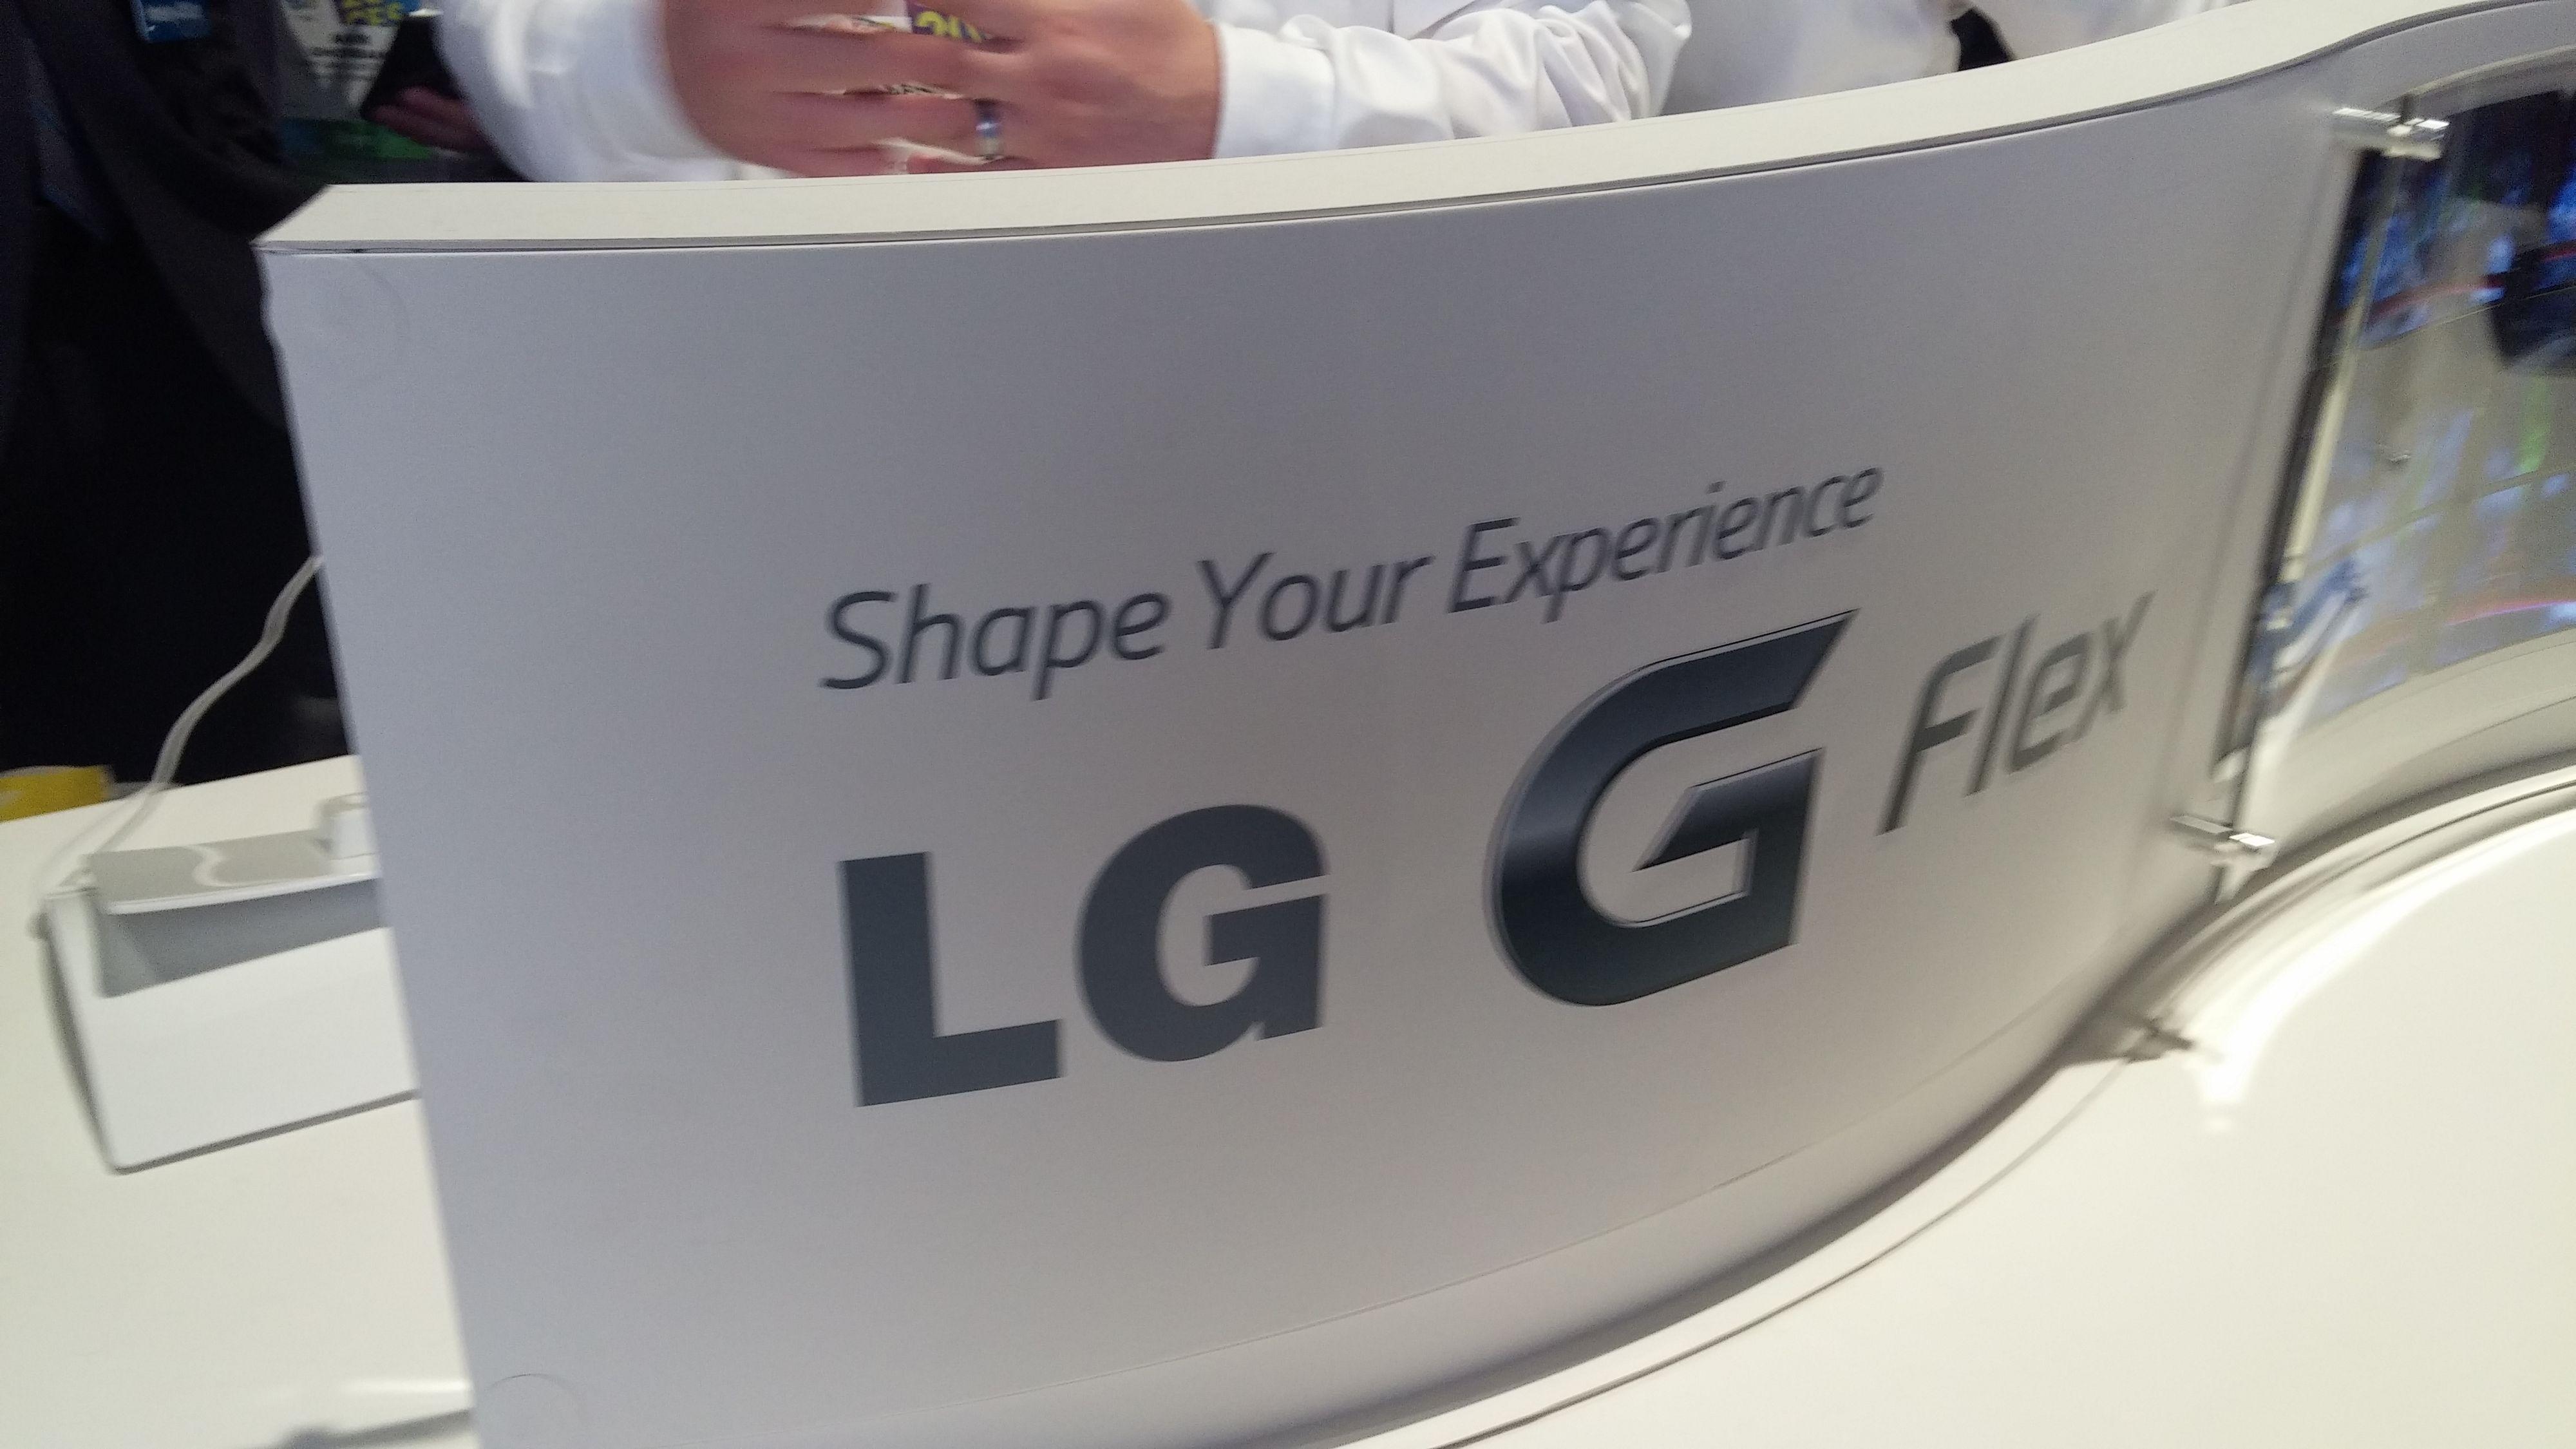 Testbilde fra LG G Flex.Foto: Finn Jarle Kvalheim, Amobil.no